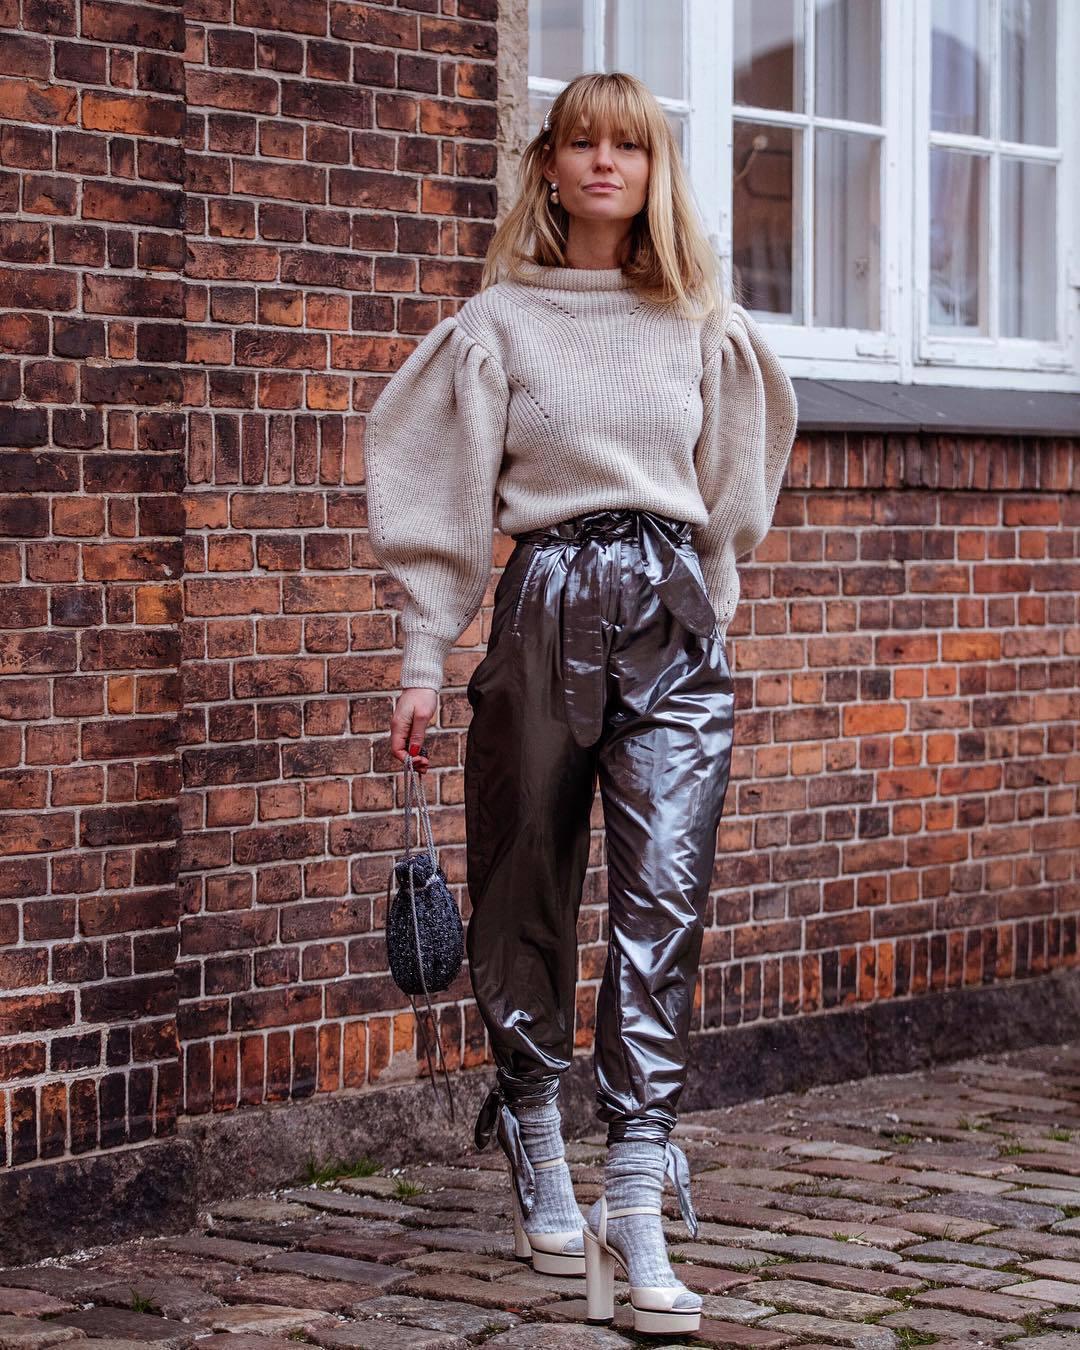 pants high waisted pants high heel sandals socks handbag oversized sweater knitted sweater puffed sleeves